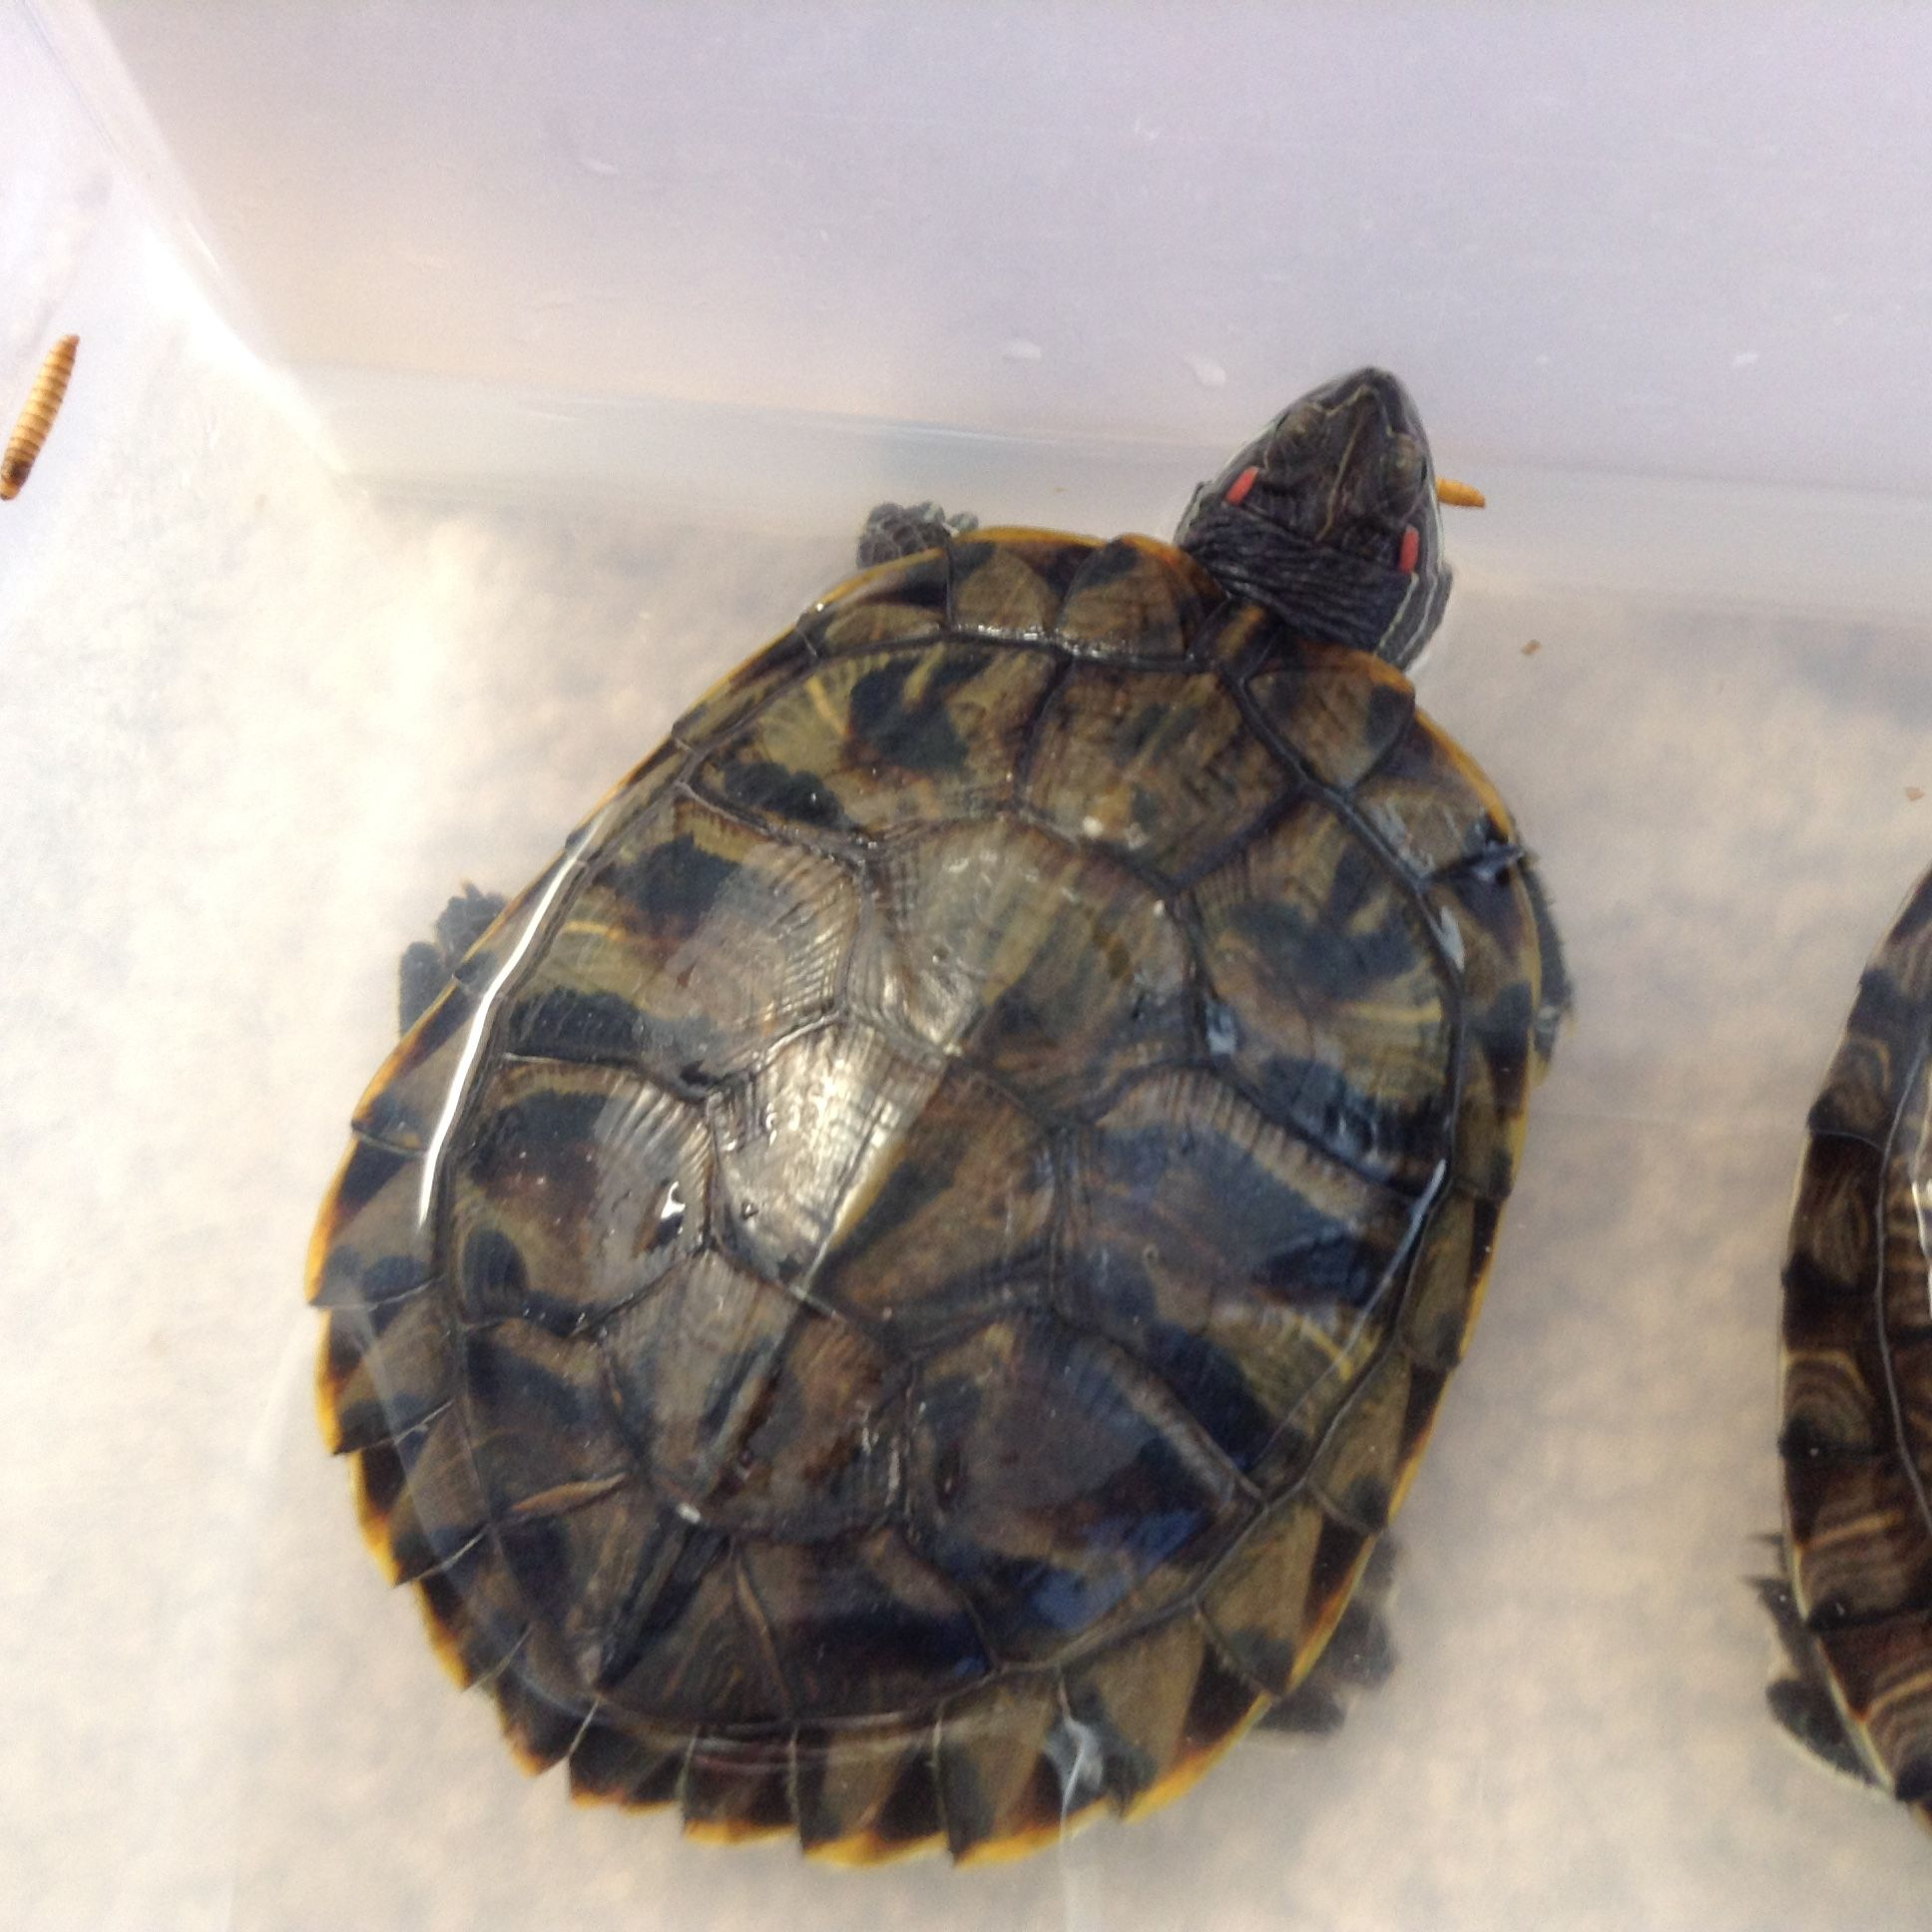 Pin by plantingsplus on slider turtles slider turtle